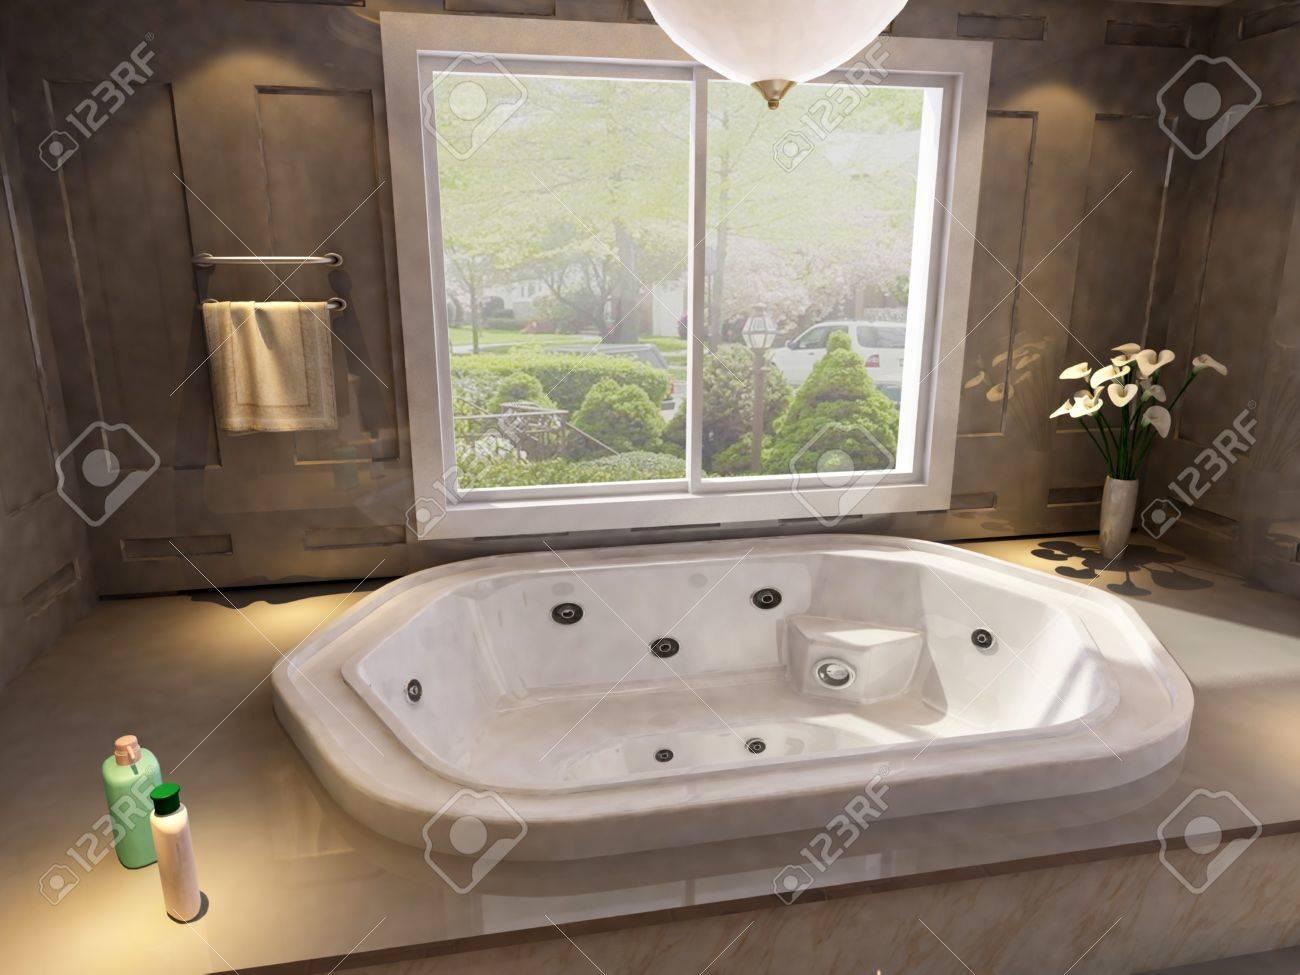 rendering of the modern bathroom interior Stock Photo - 9713070